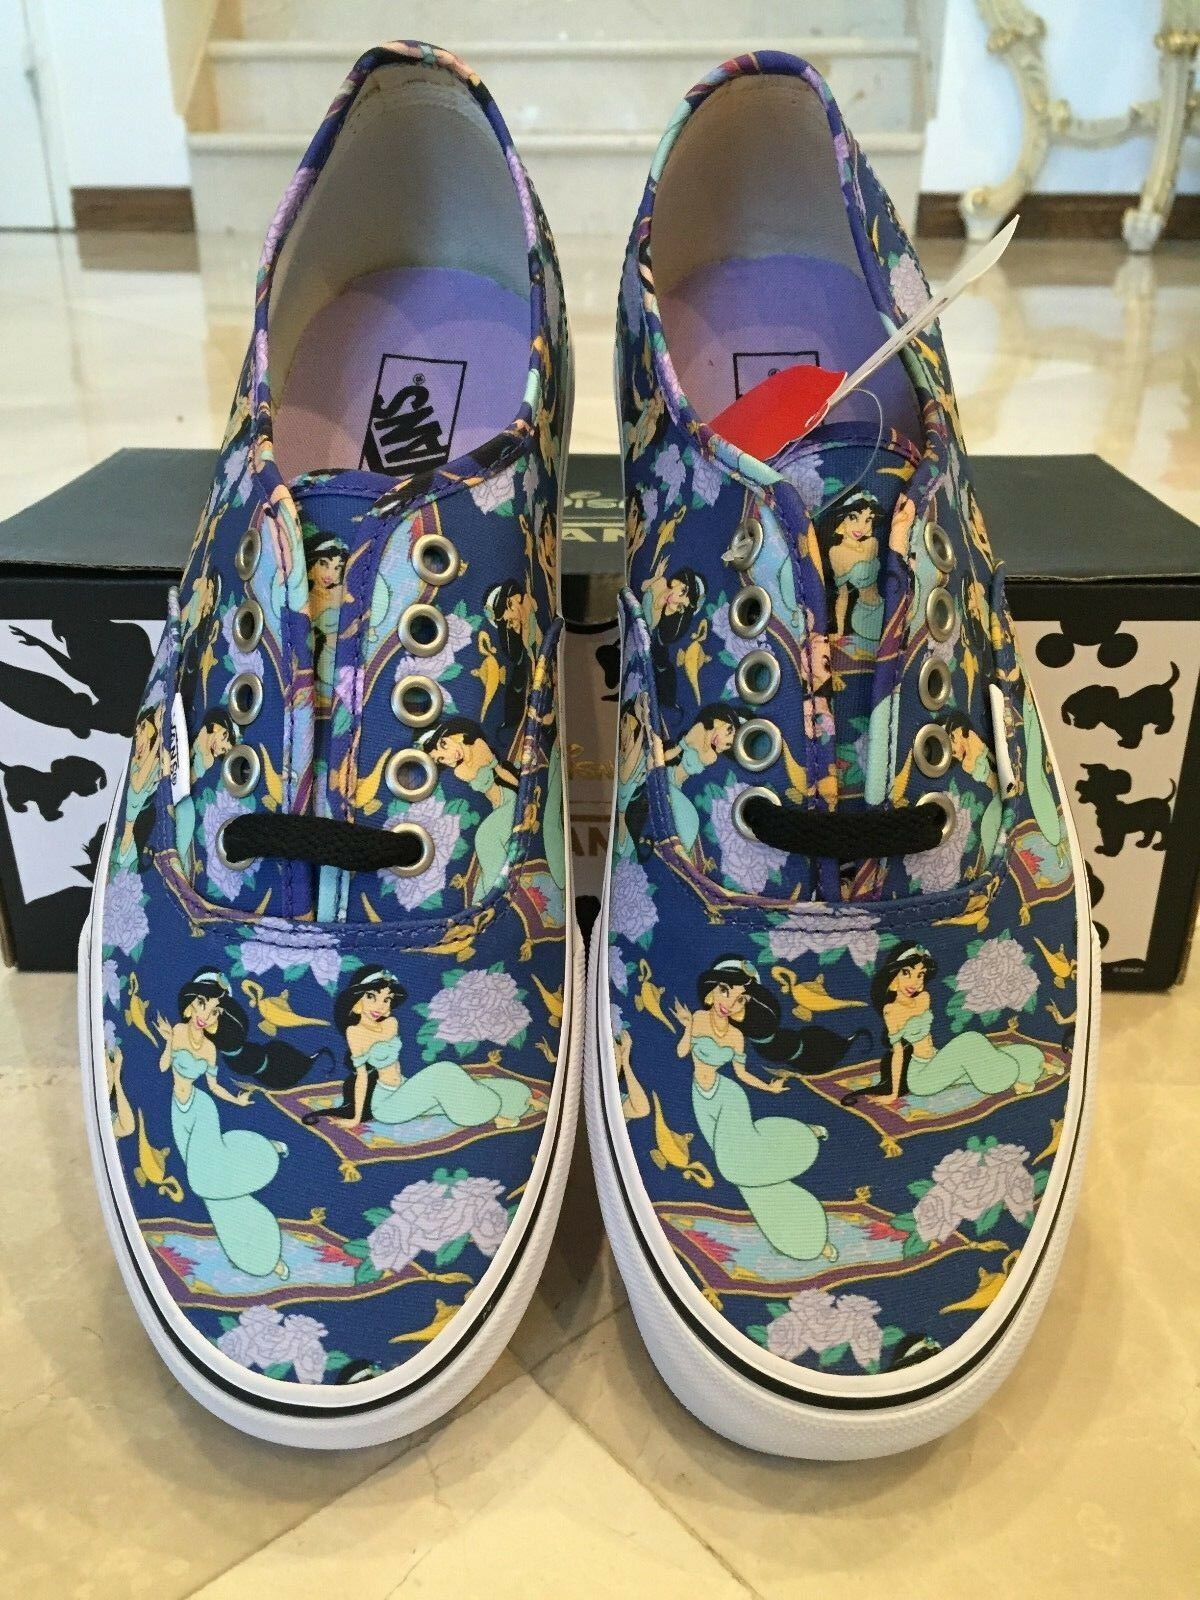 Authentic Disney Princess Jasmine Vans Men's Size 10 (Women's Size 11.5)